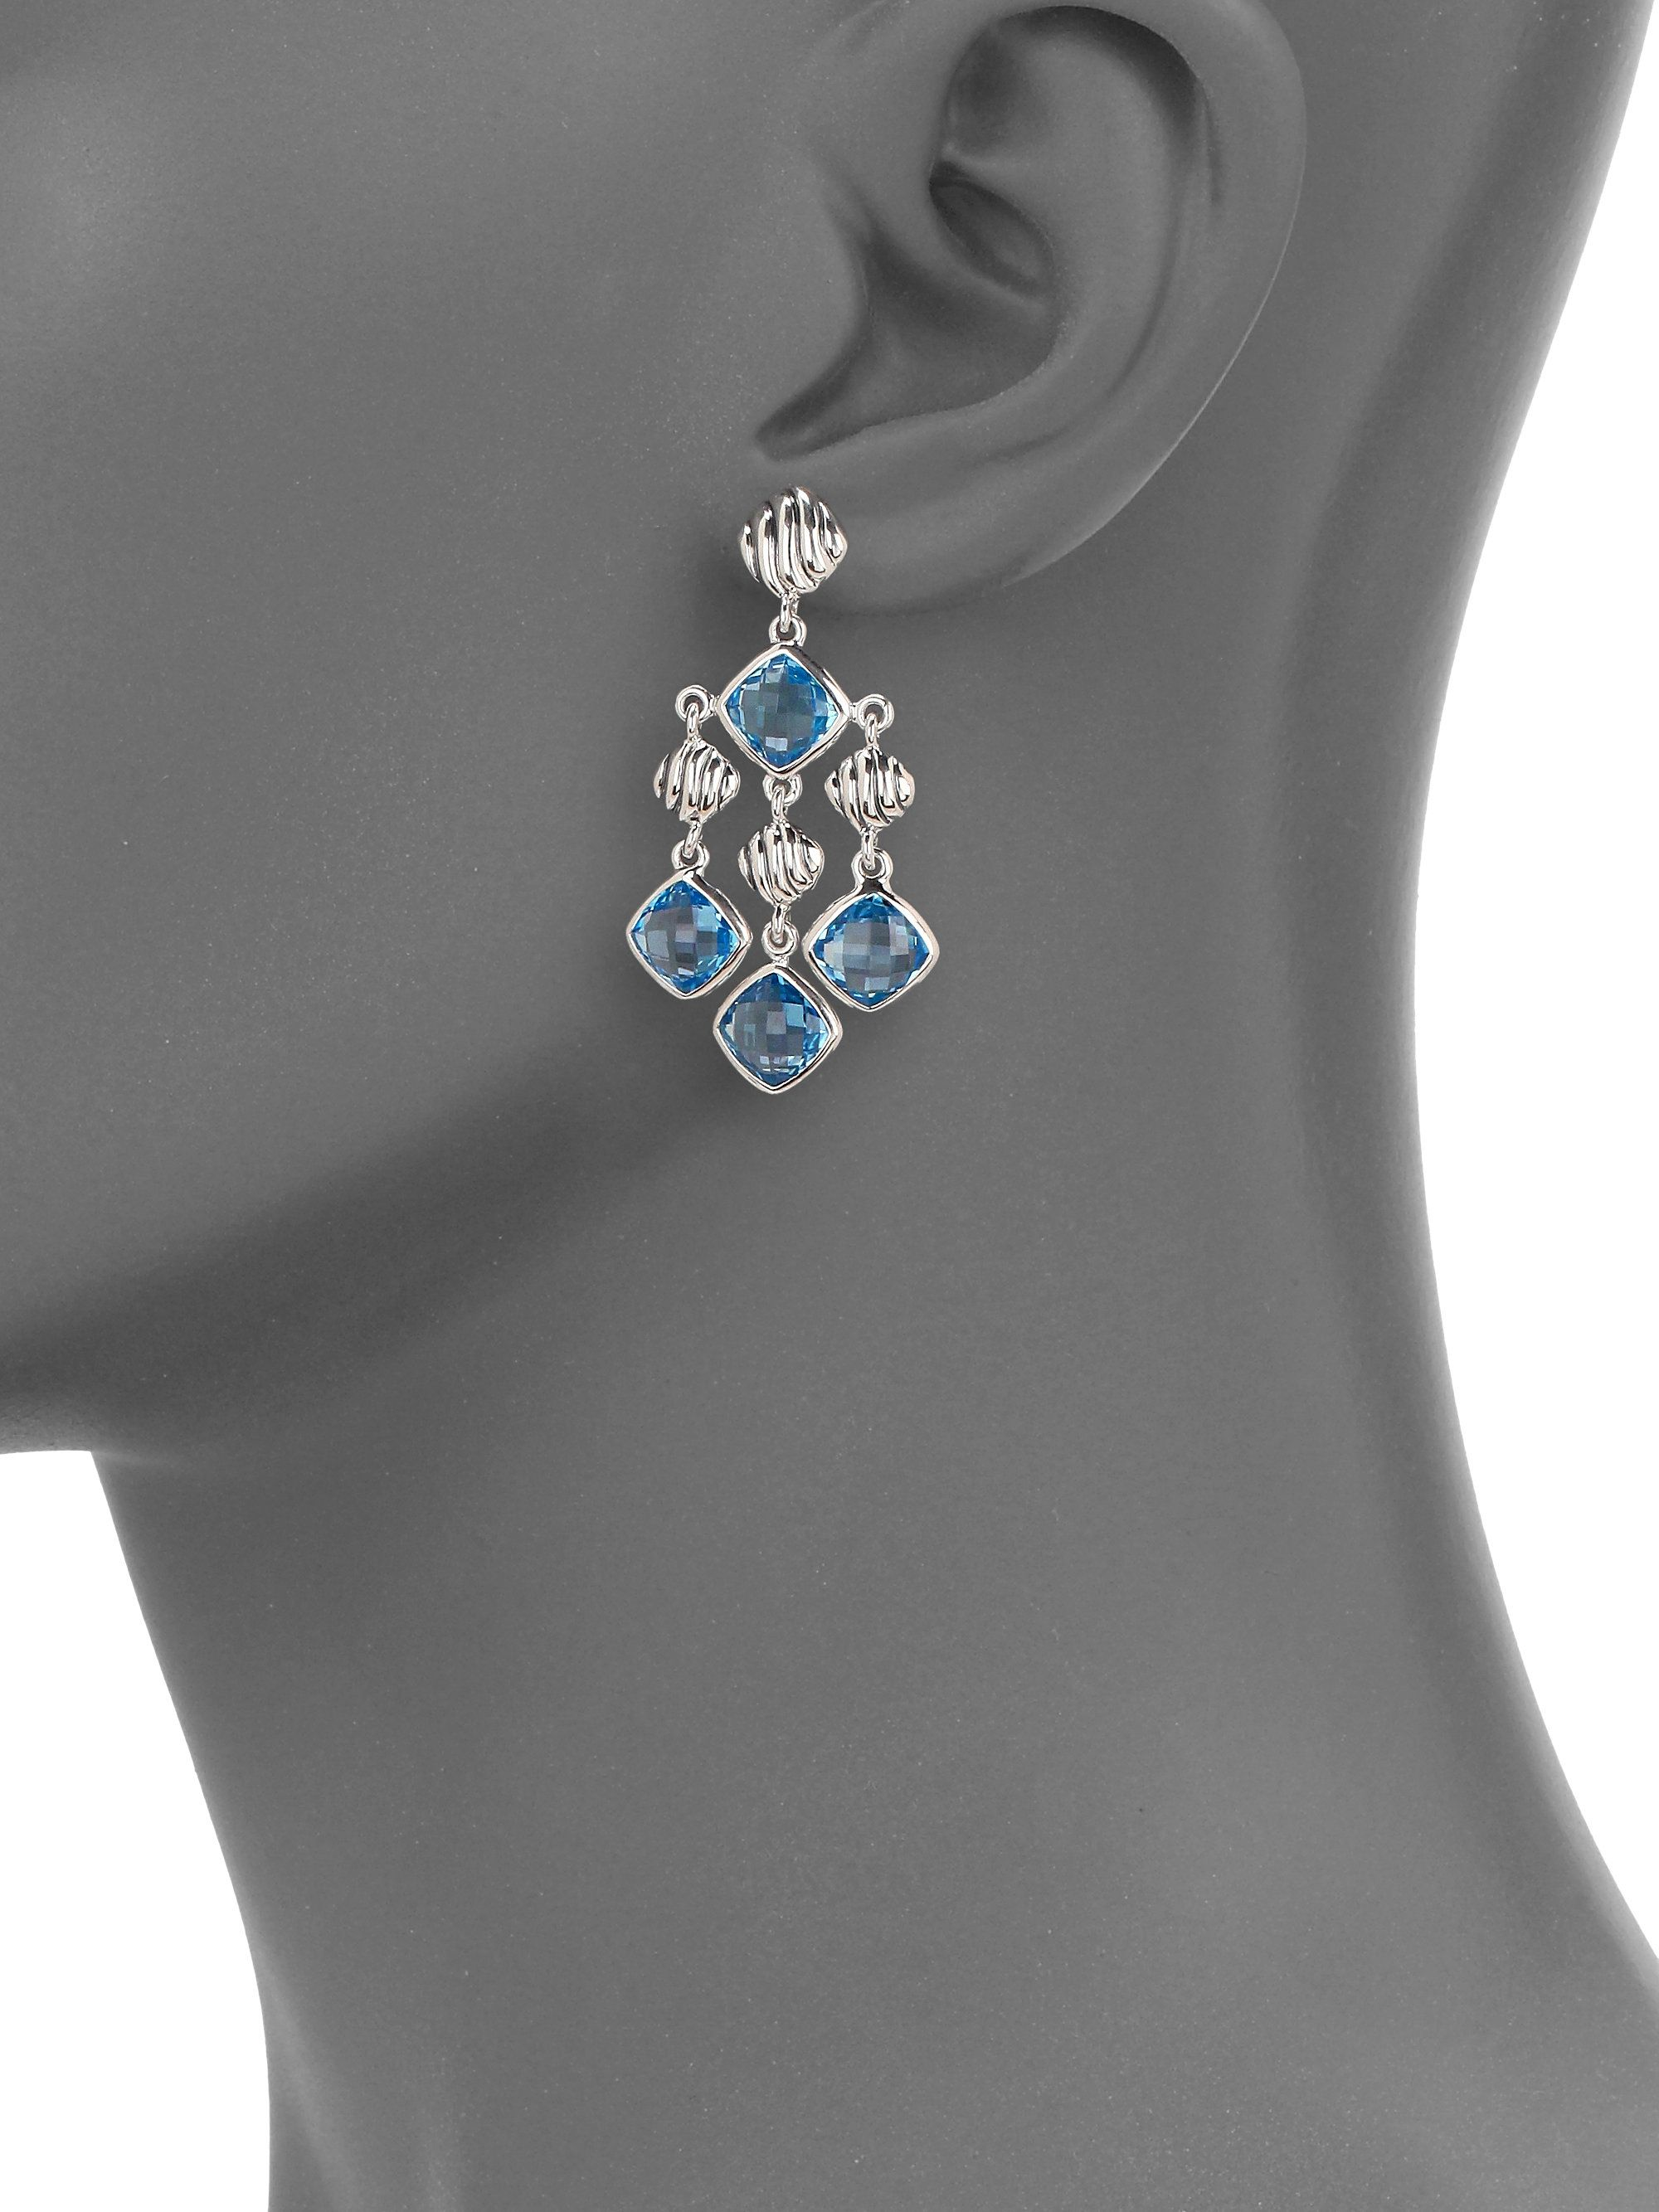 David yurman blue topaz sterling silver chandelier earrings in blue david yurman blue topaz sterling silver chandelier earrings in blue blue multi aloadofball Image collections